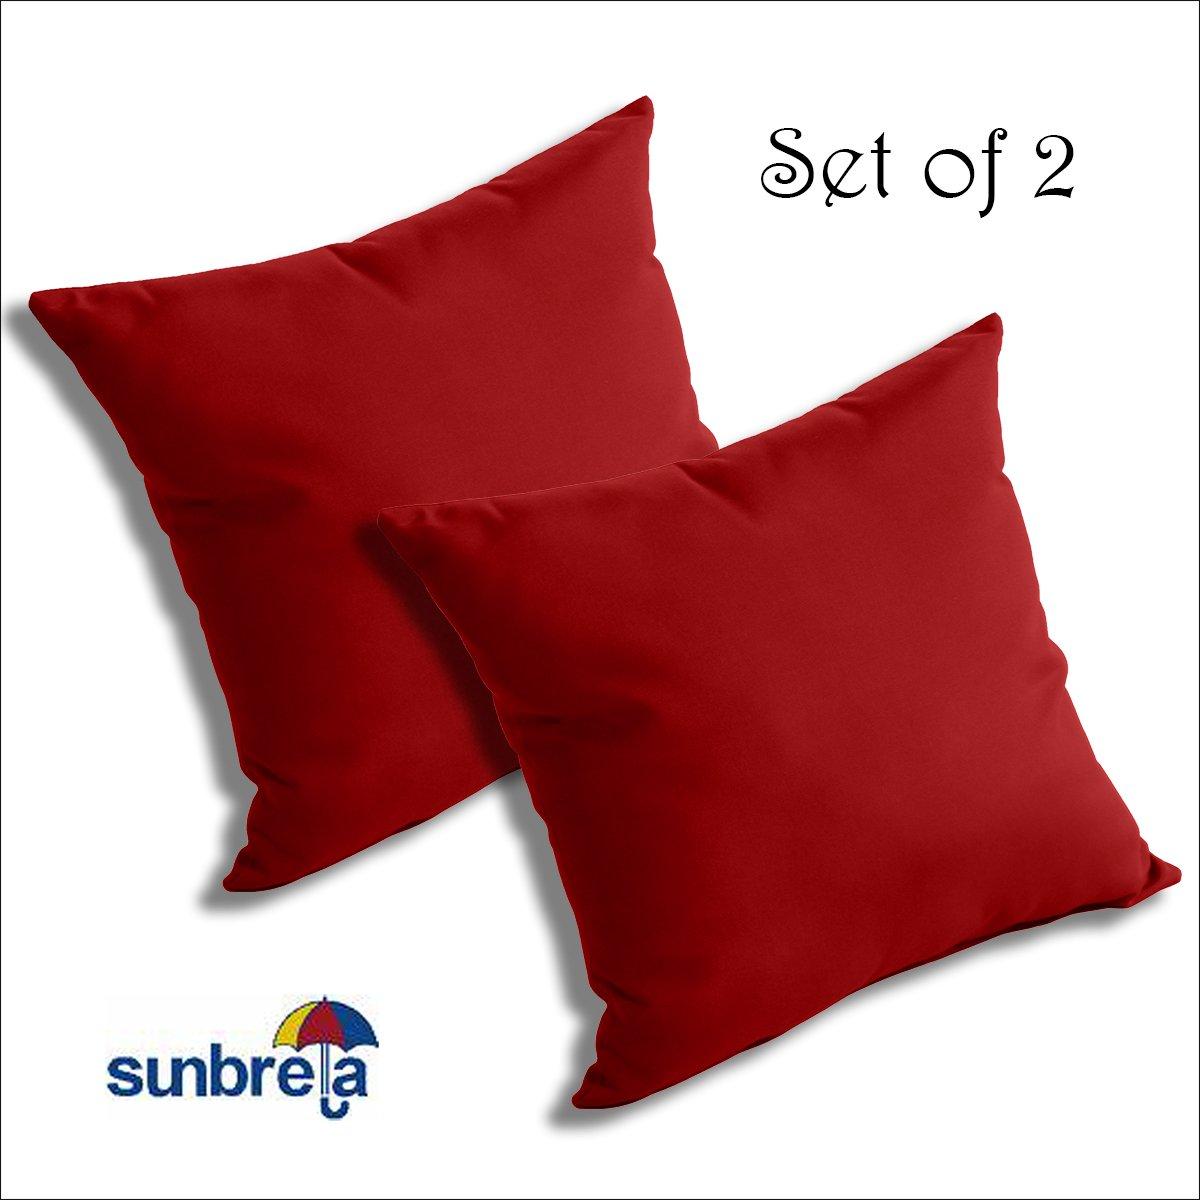 SET OF 2 Sunbrella Outdoor/Indoor THROW PILLOWS by Comfort Classics Inc. (JOCKEY RED)